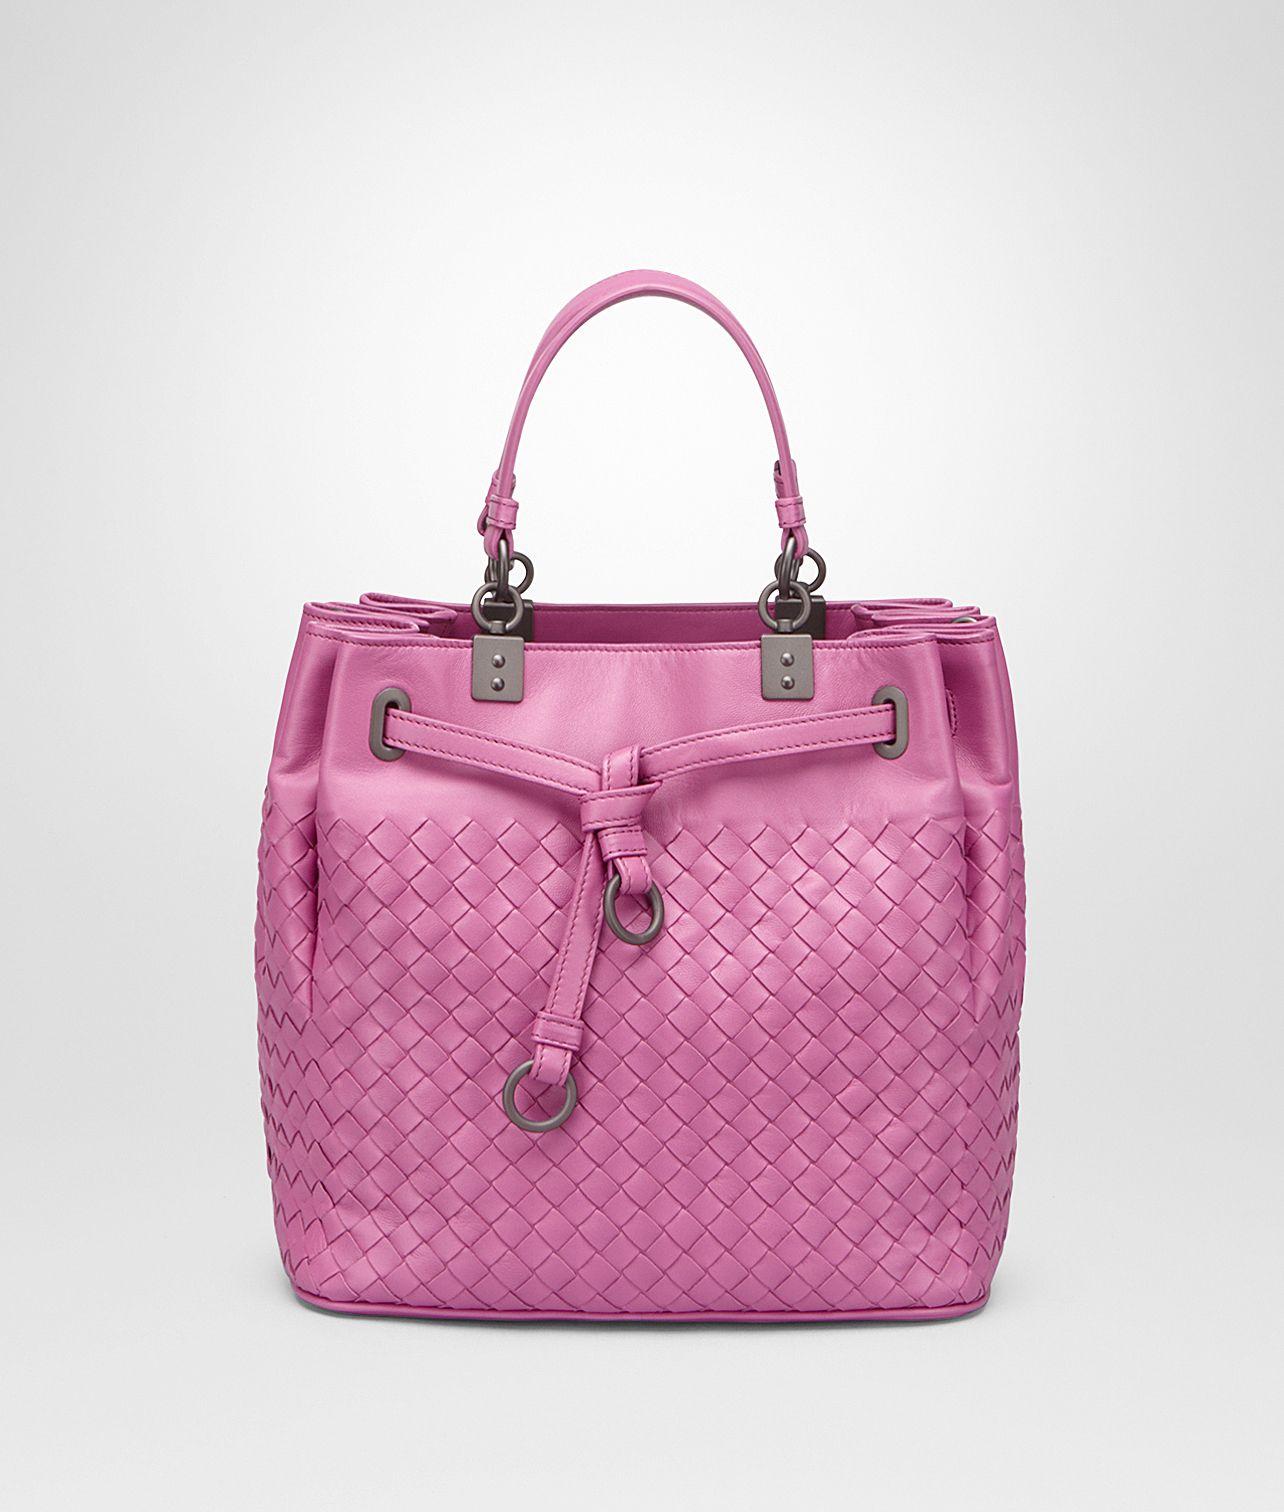 Shop Bottega Veneta® Women s BUCKET BAG IN PACIFIC INTRECCIATO NAPPA.  Discover more details about the item. 229faecae5bd9